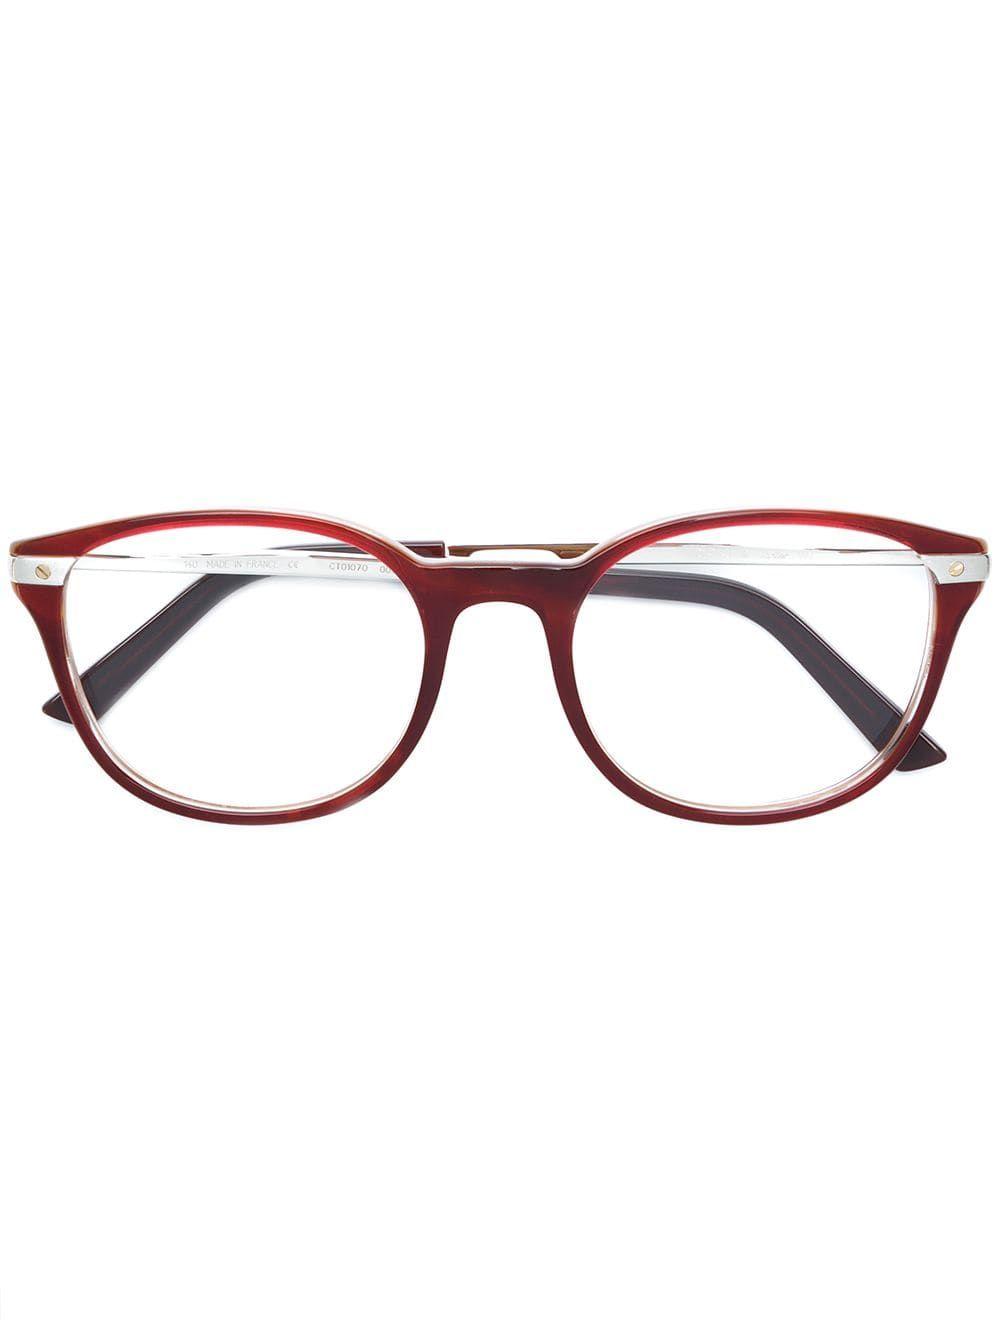 Cartier Eyewear Santos de Cartier glasses – Brown